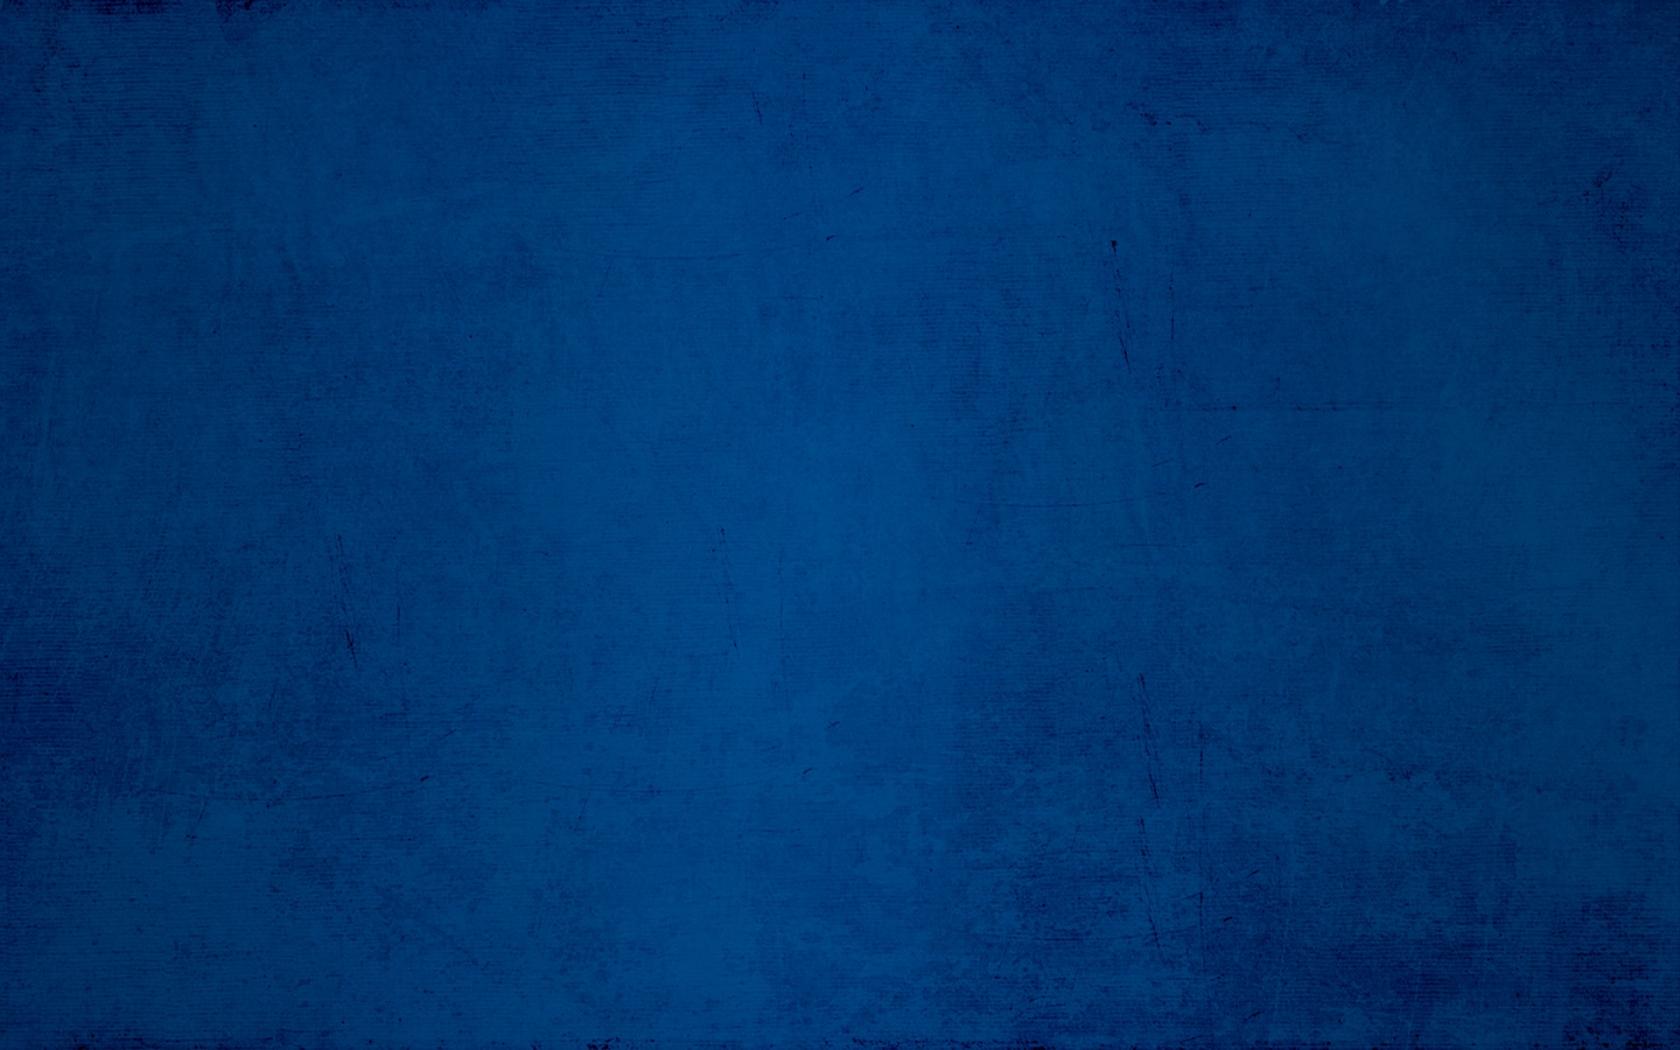 Textura fondo azul hd 1680x1050 imagenes wallpapers for Disenos de fondos